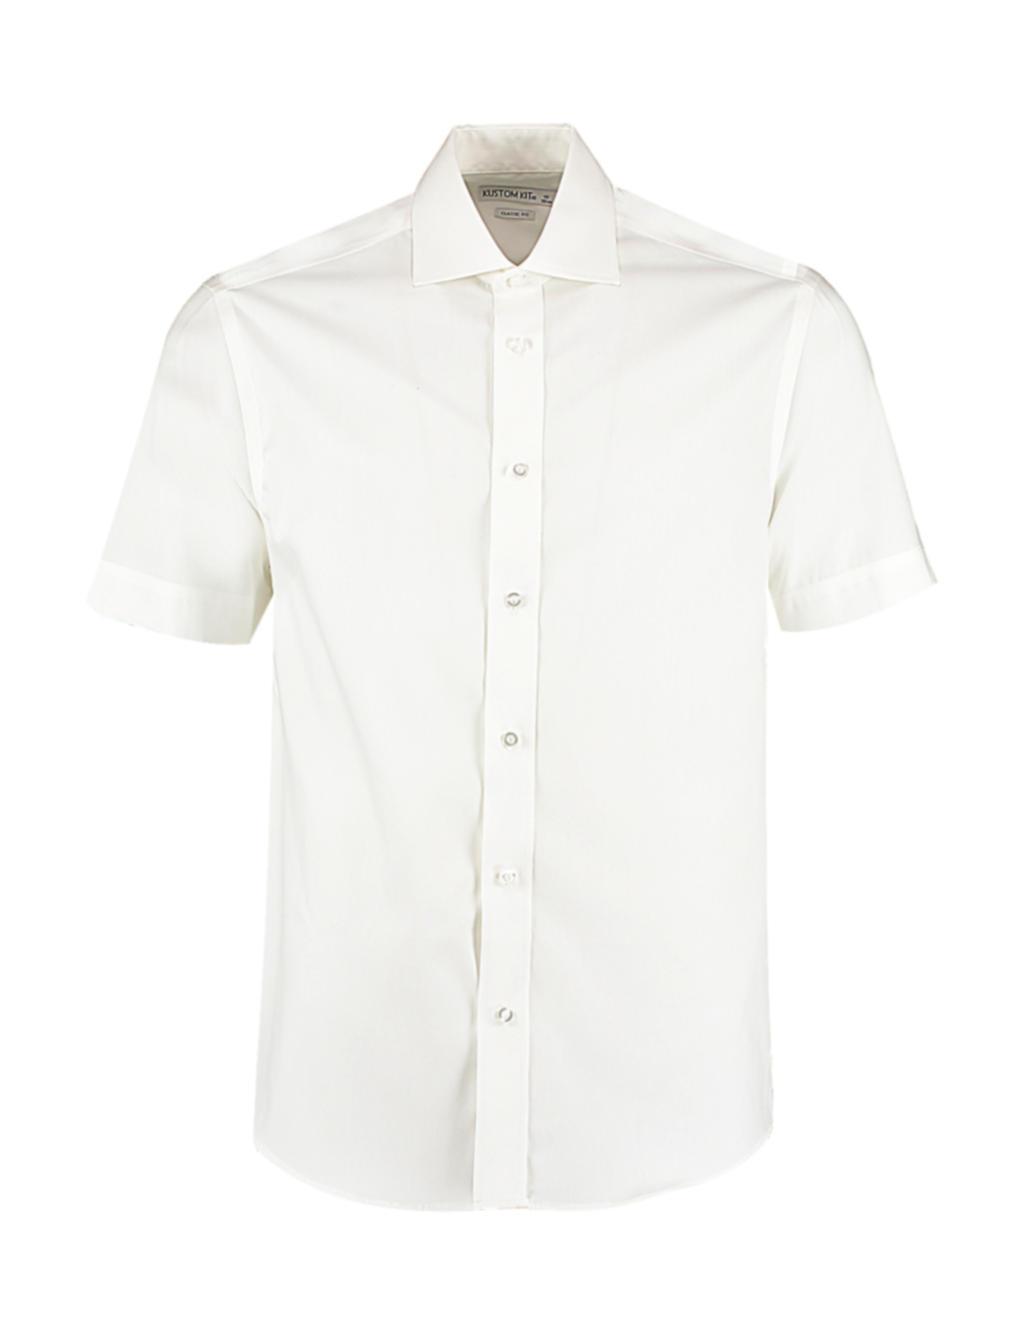 Classic Fit Premium Cutaway Oxford Shirt SSL